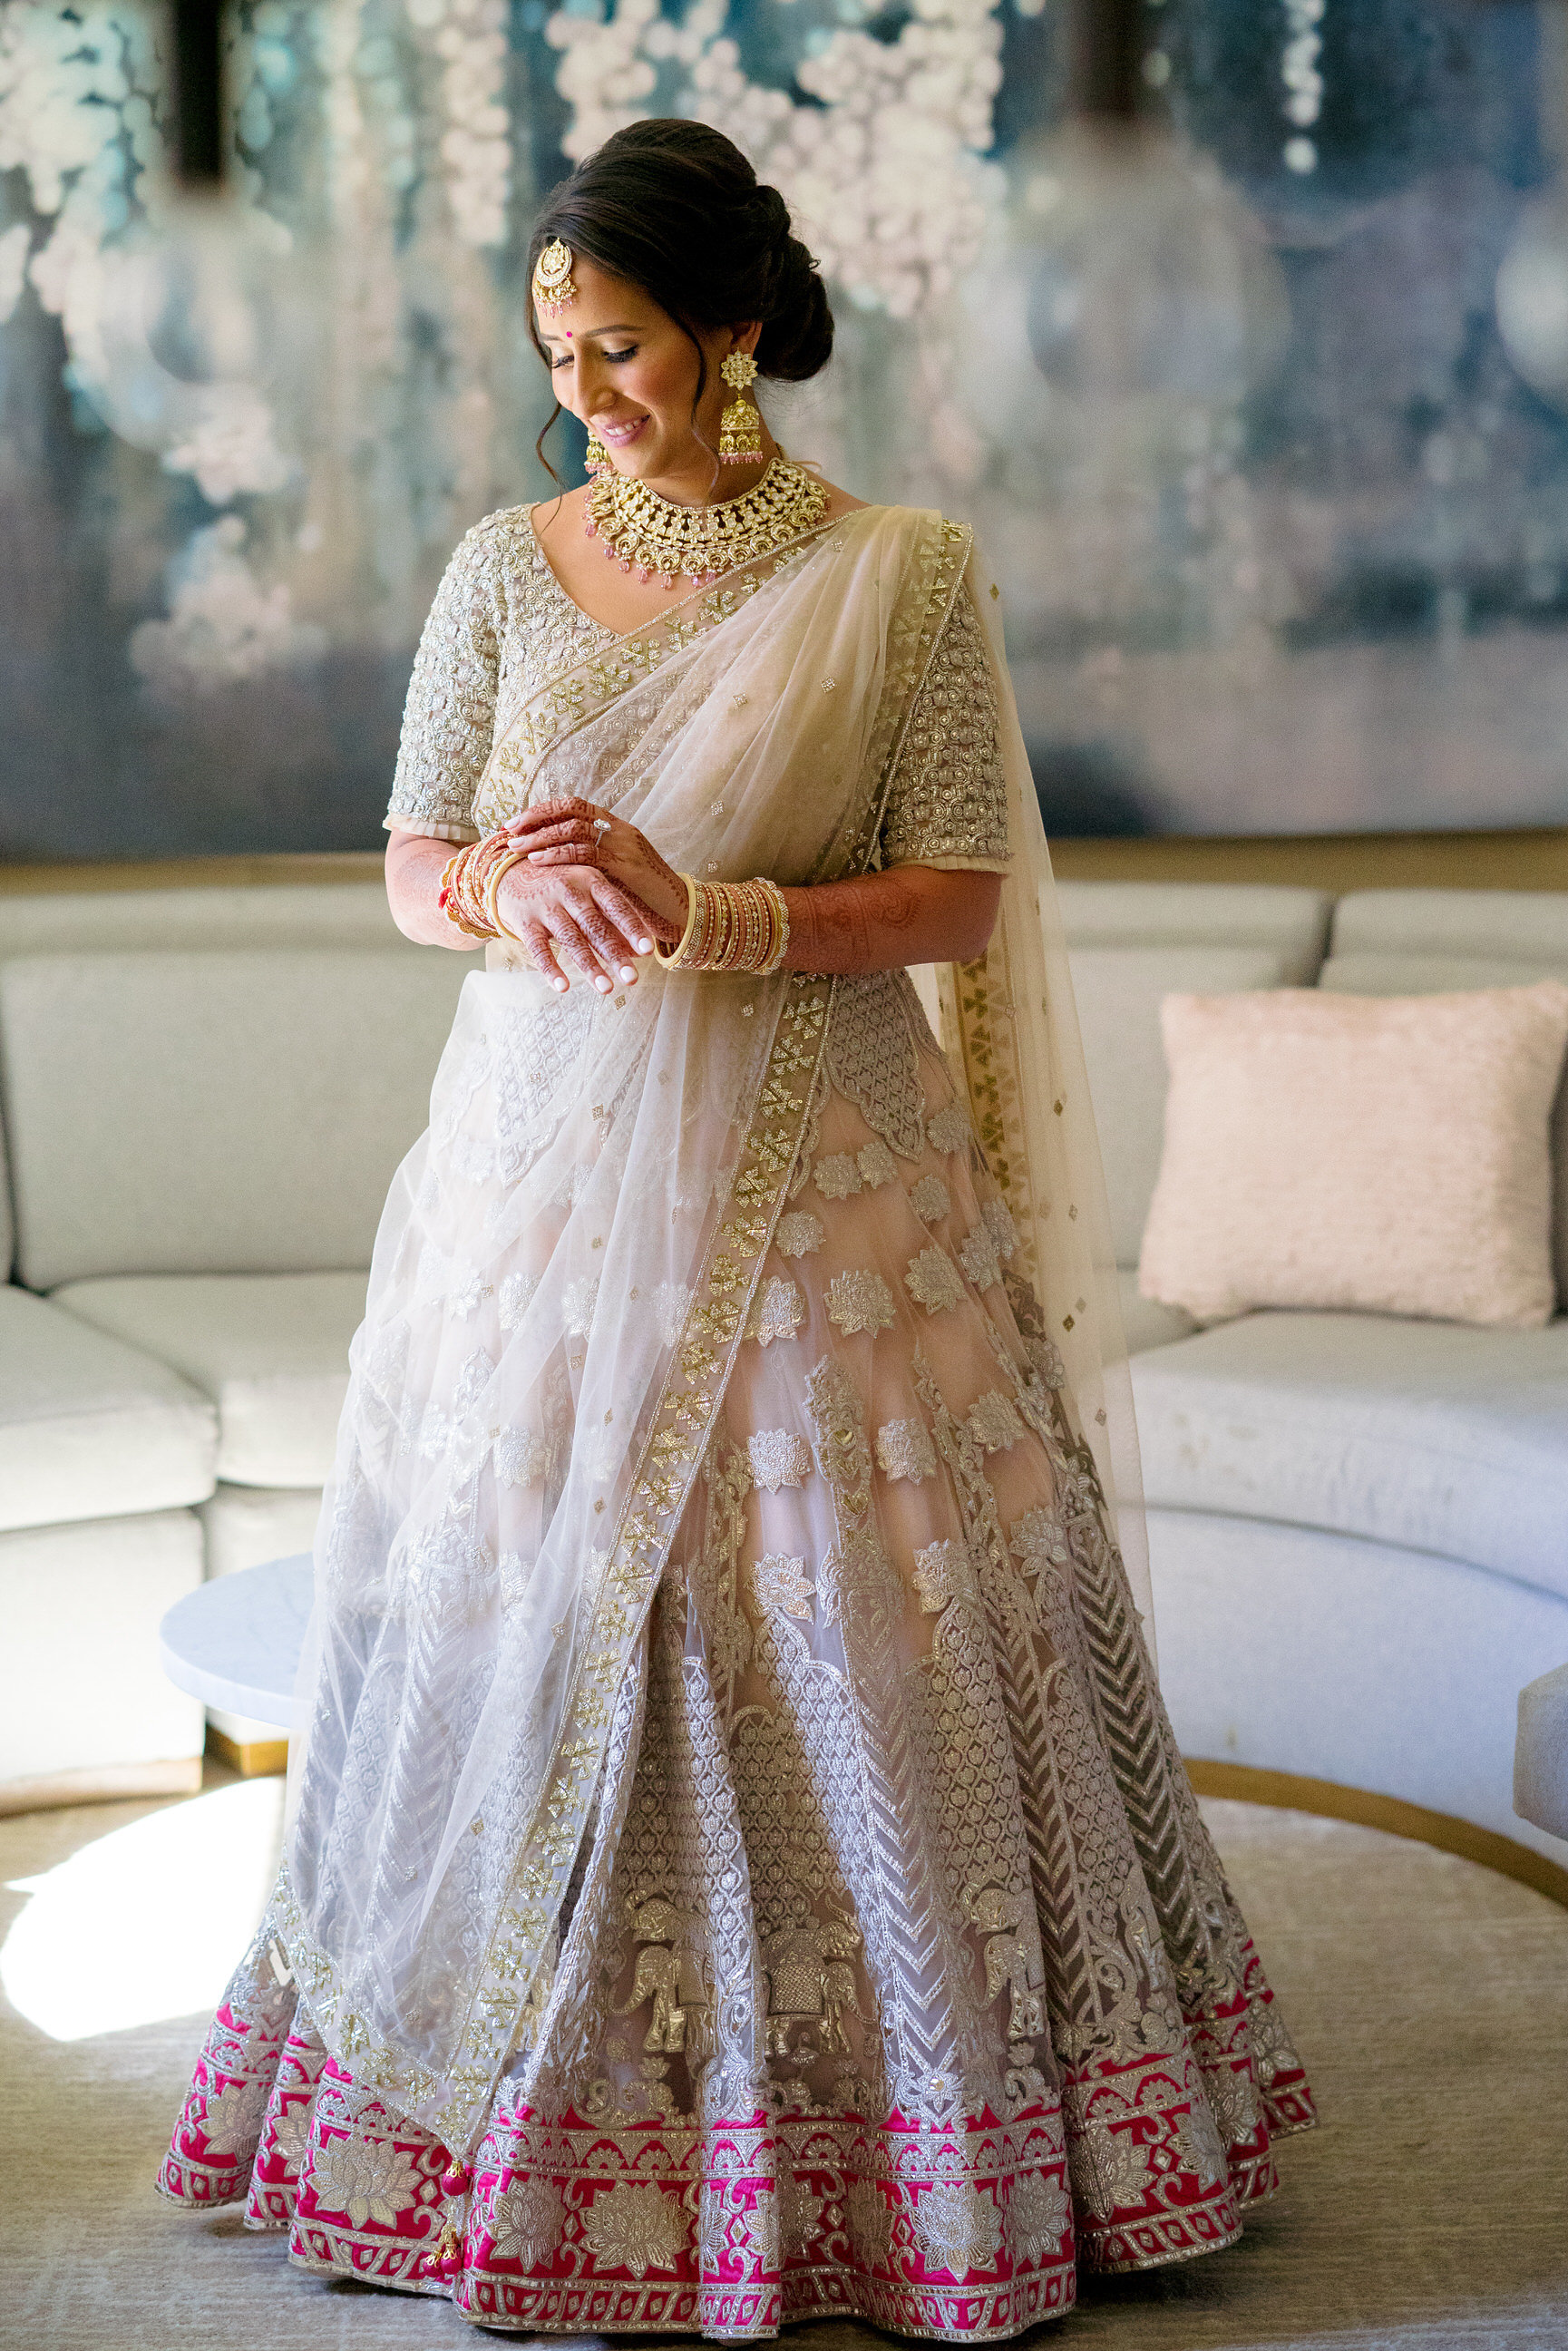 INDIAN WEDDING BRIDE IN WEDDING ATTIRE2.JPG